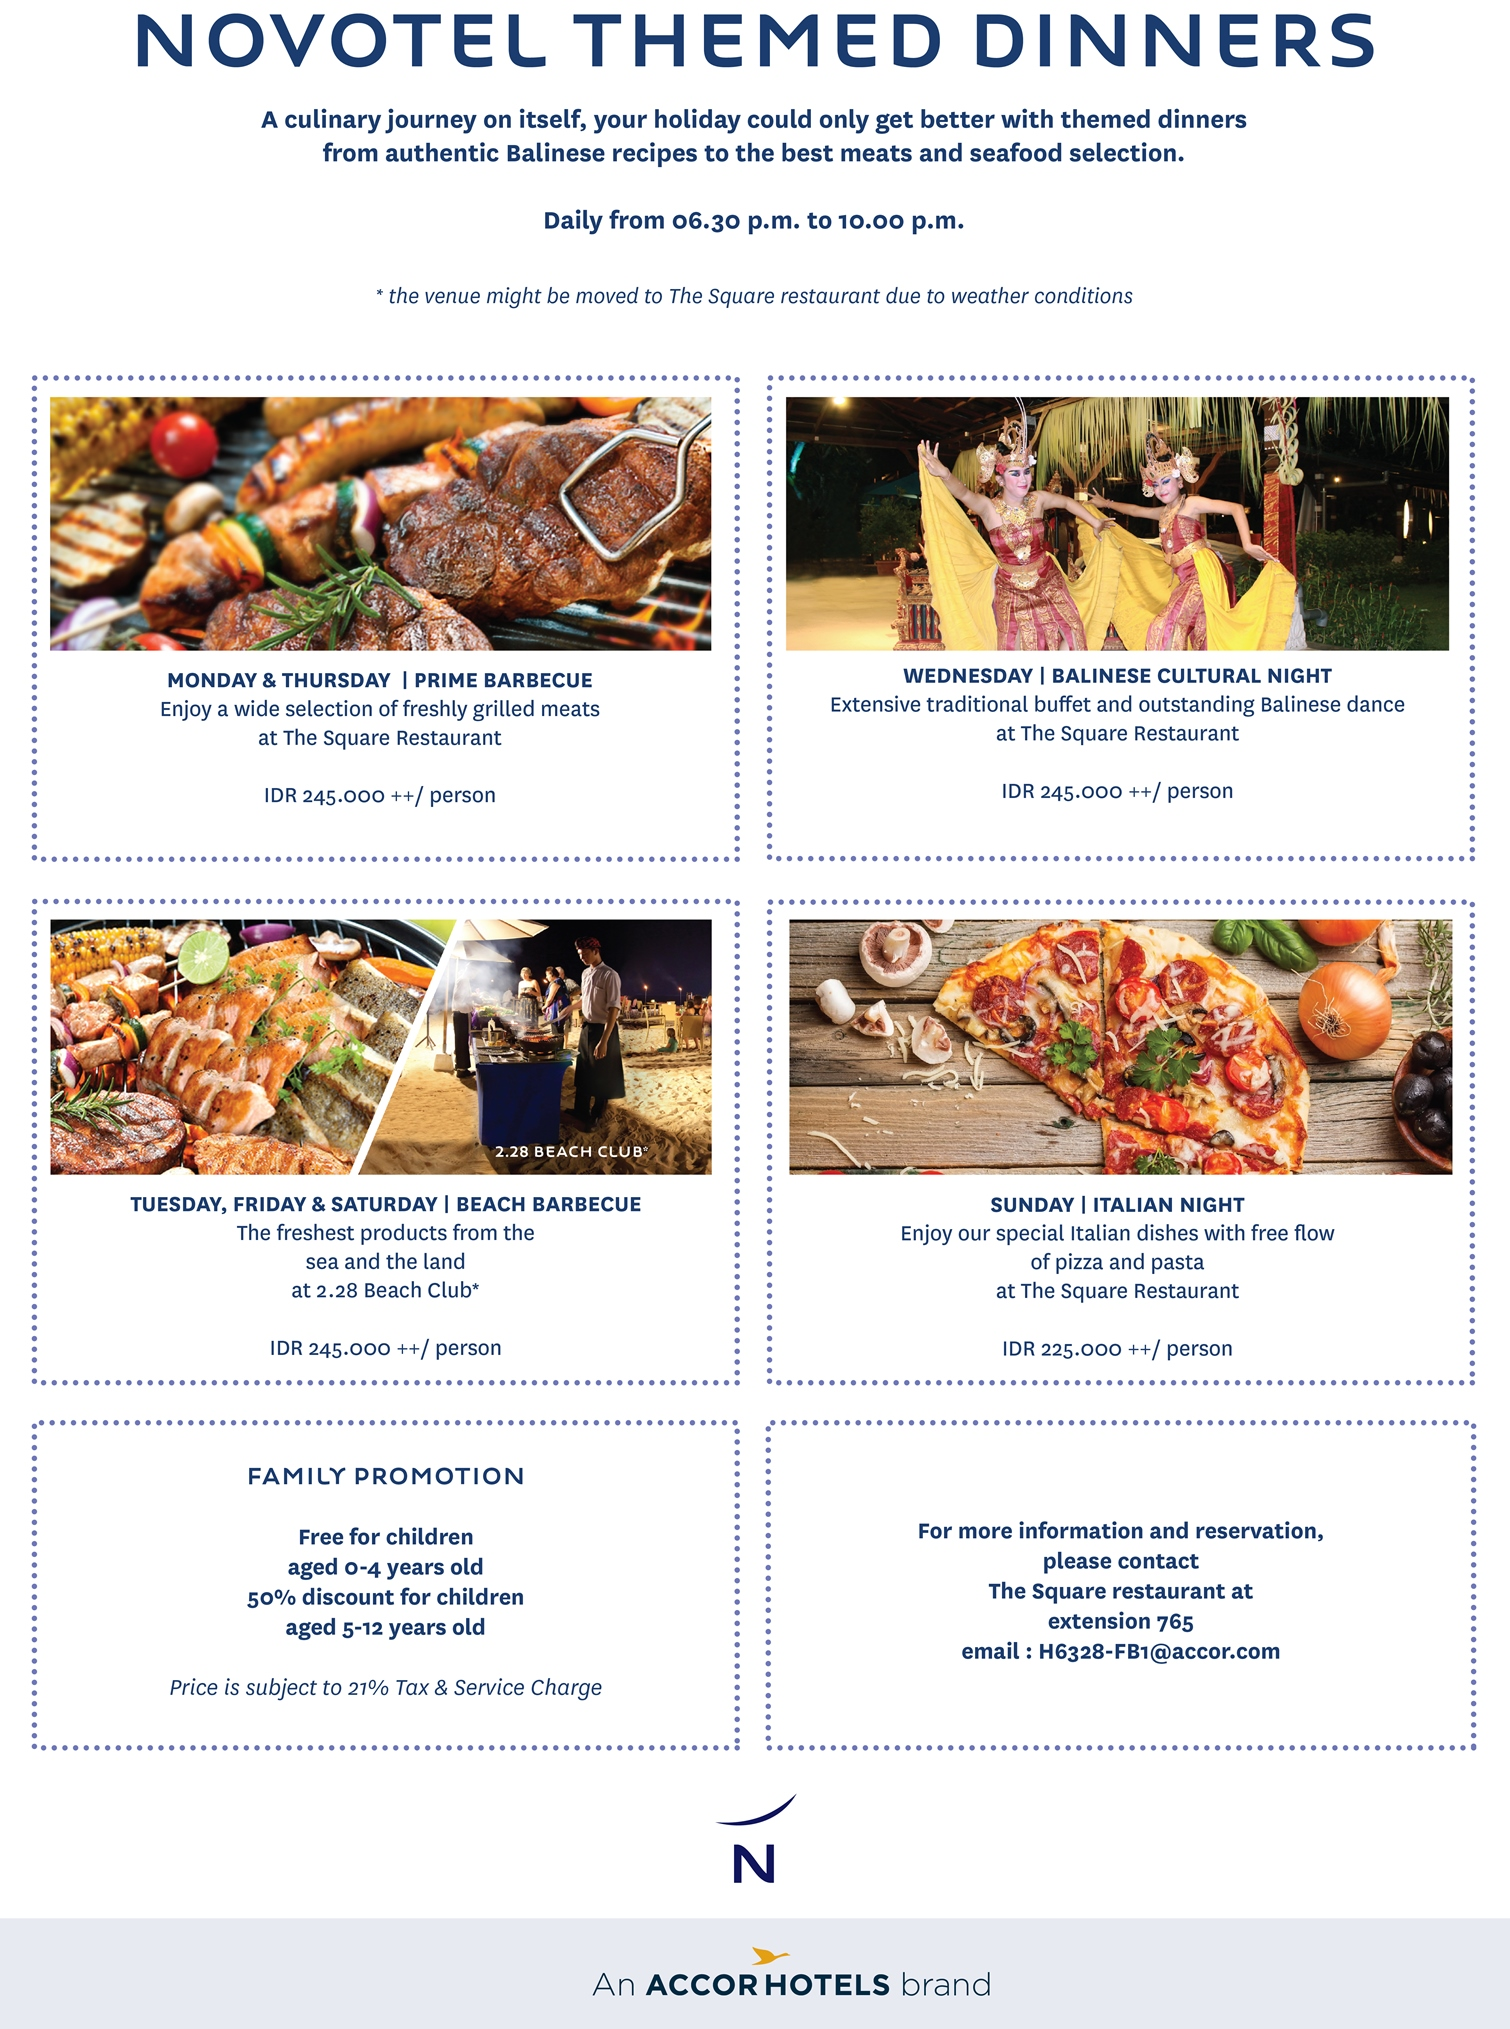 novotel-bali-nusa-dua-theme-dinner-2017